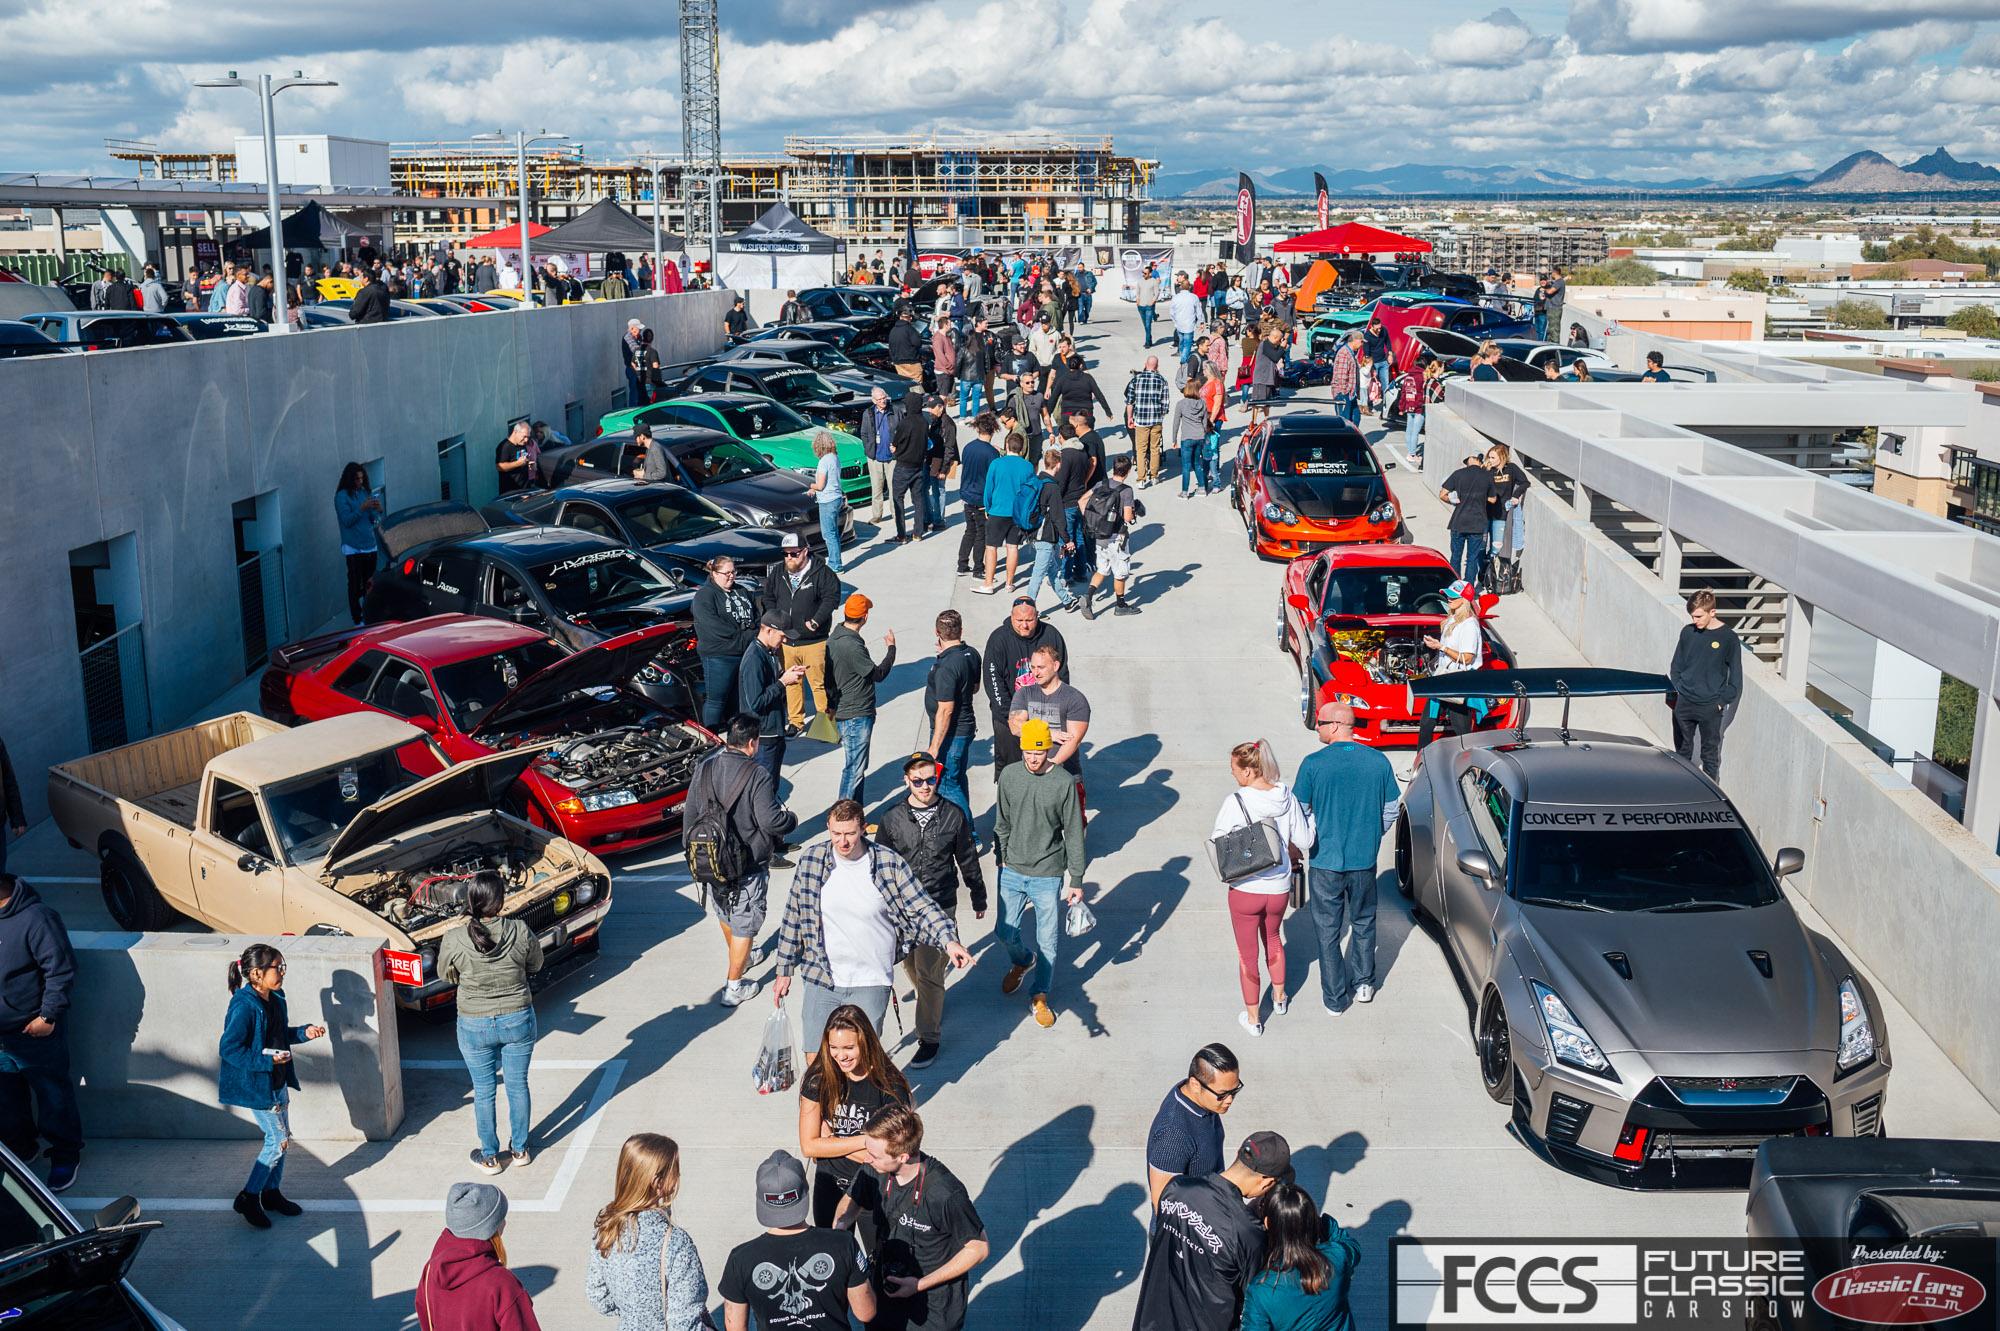 Future Classic Car Show crowd